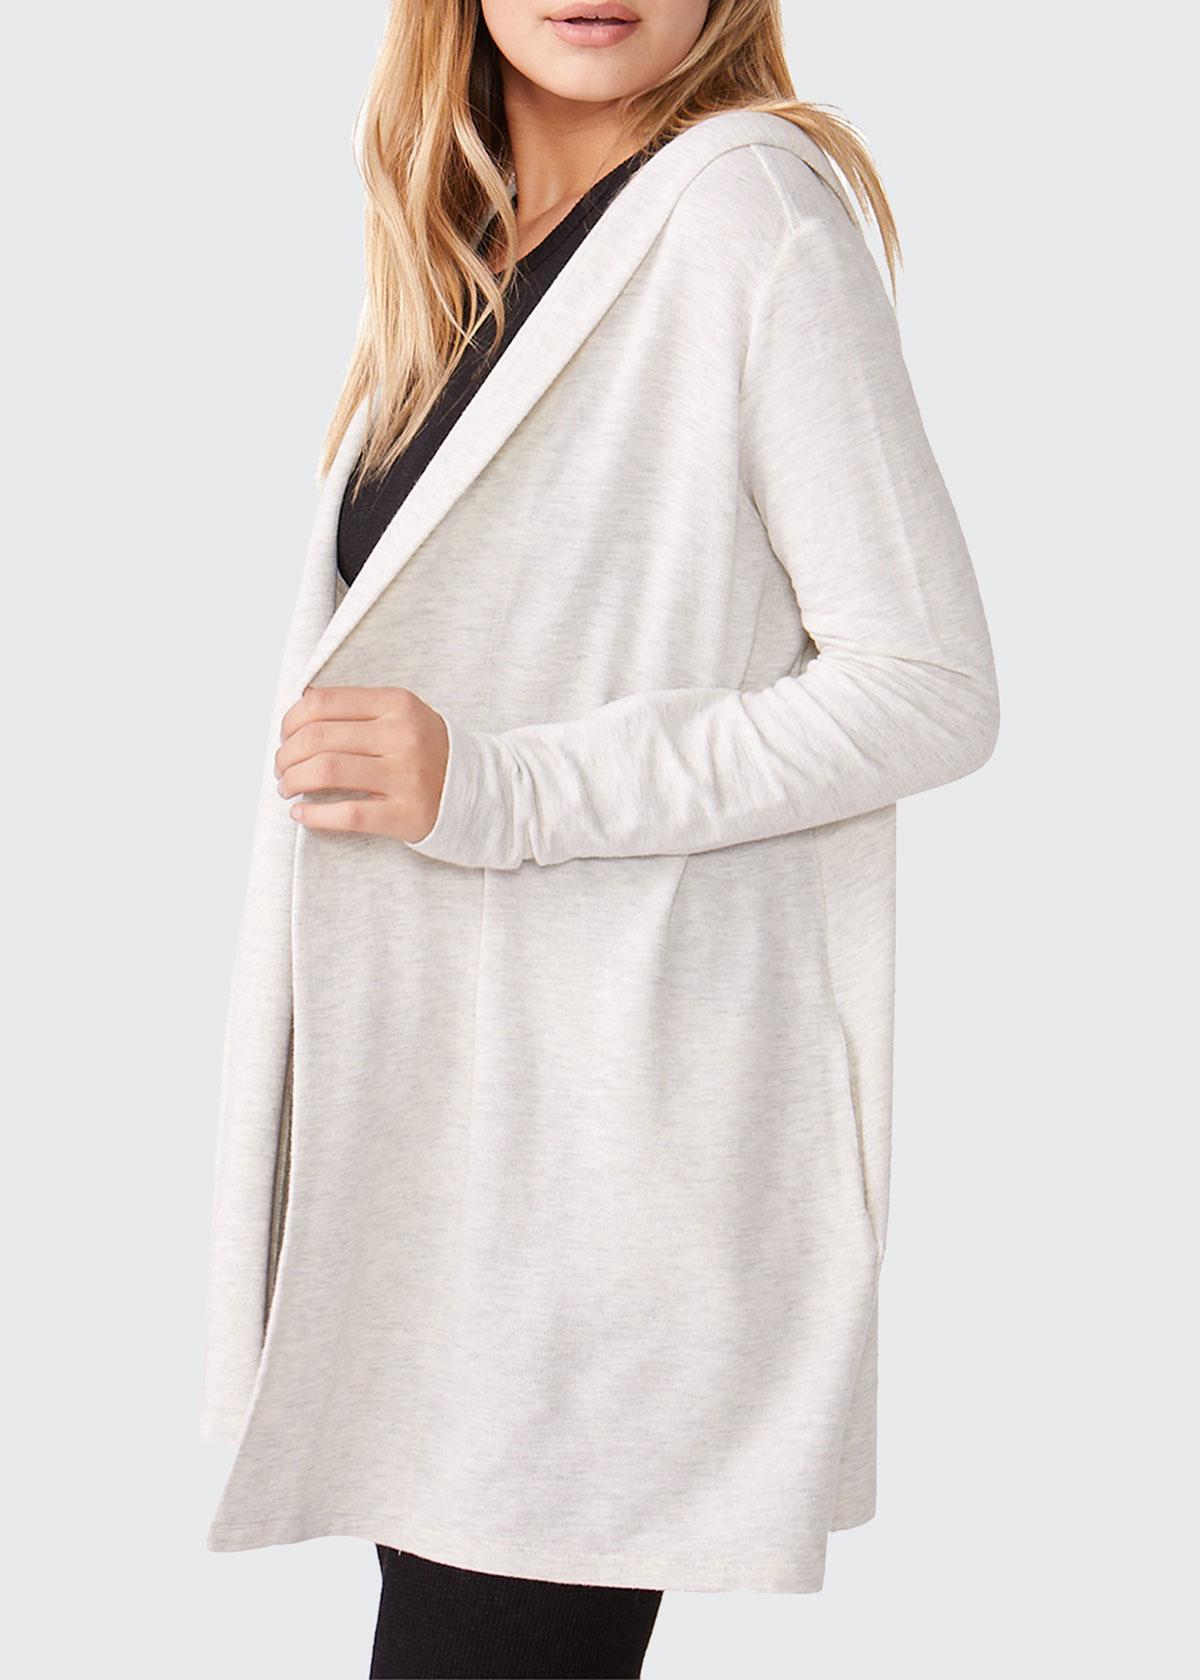 Monrow Womens Hooded Cardigan